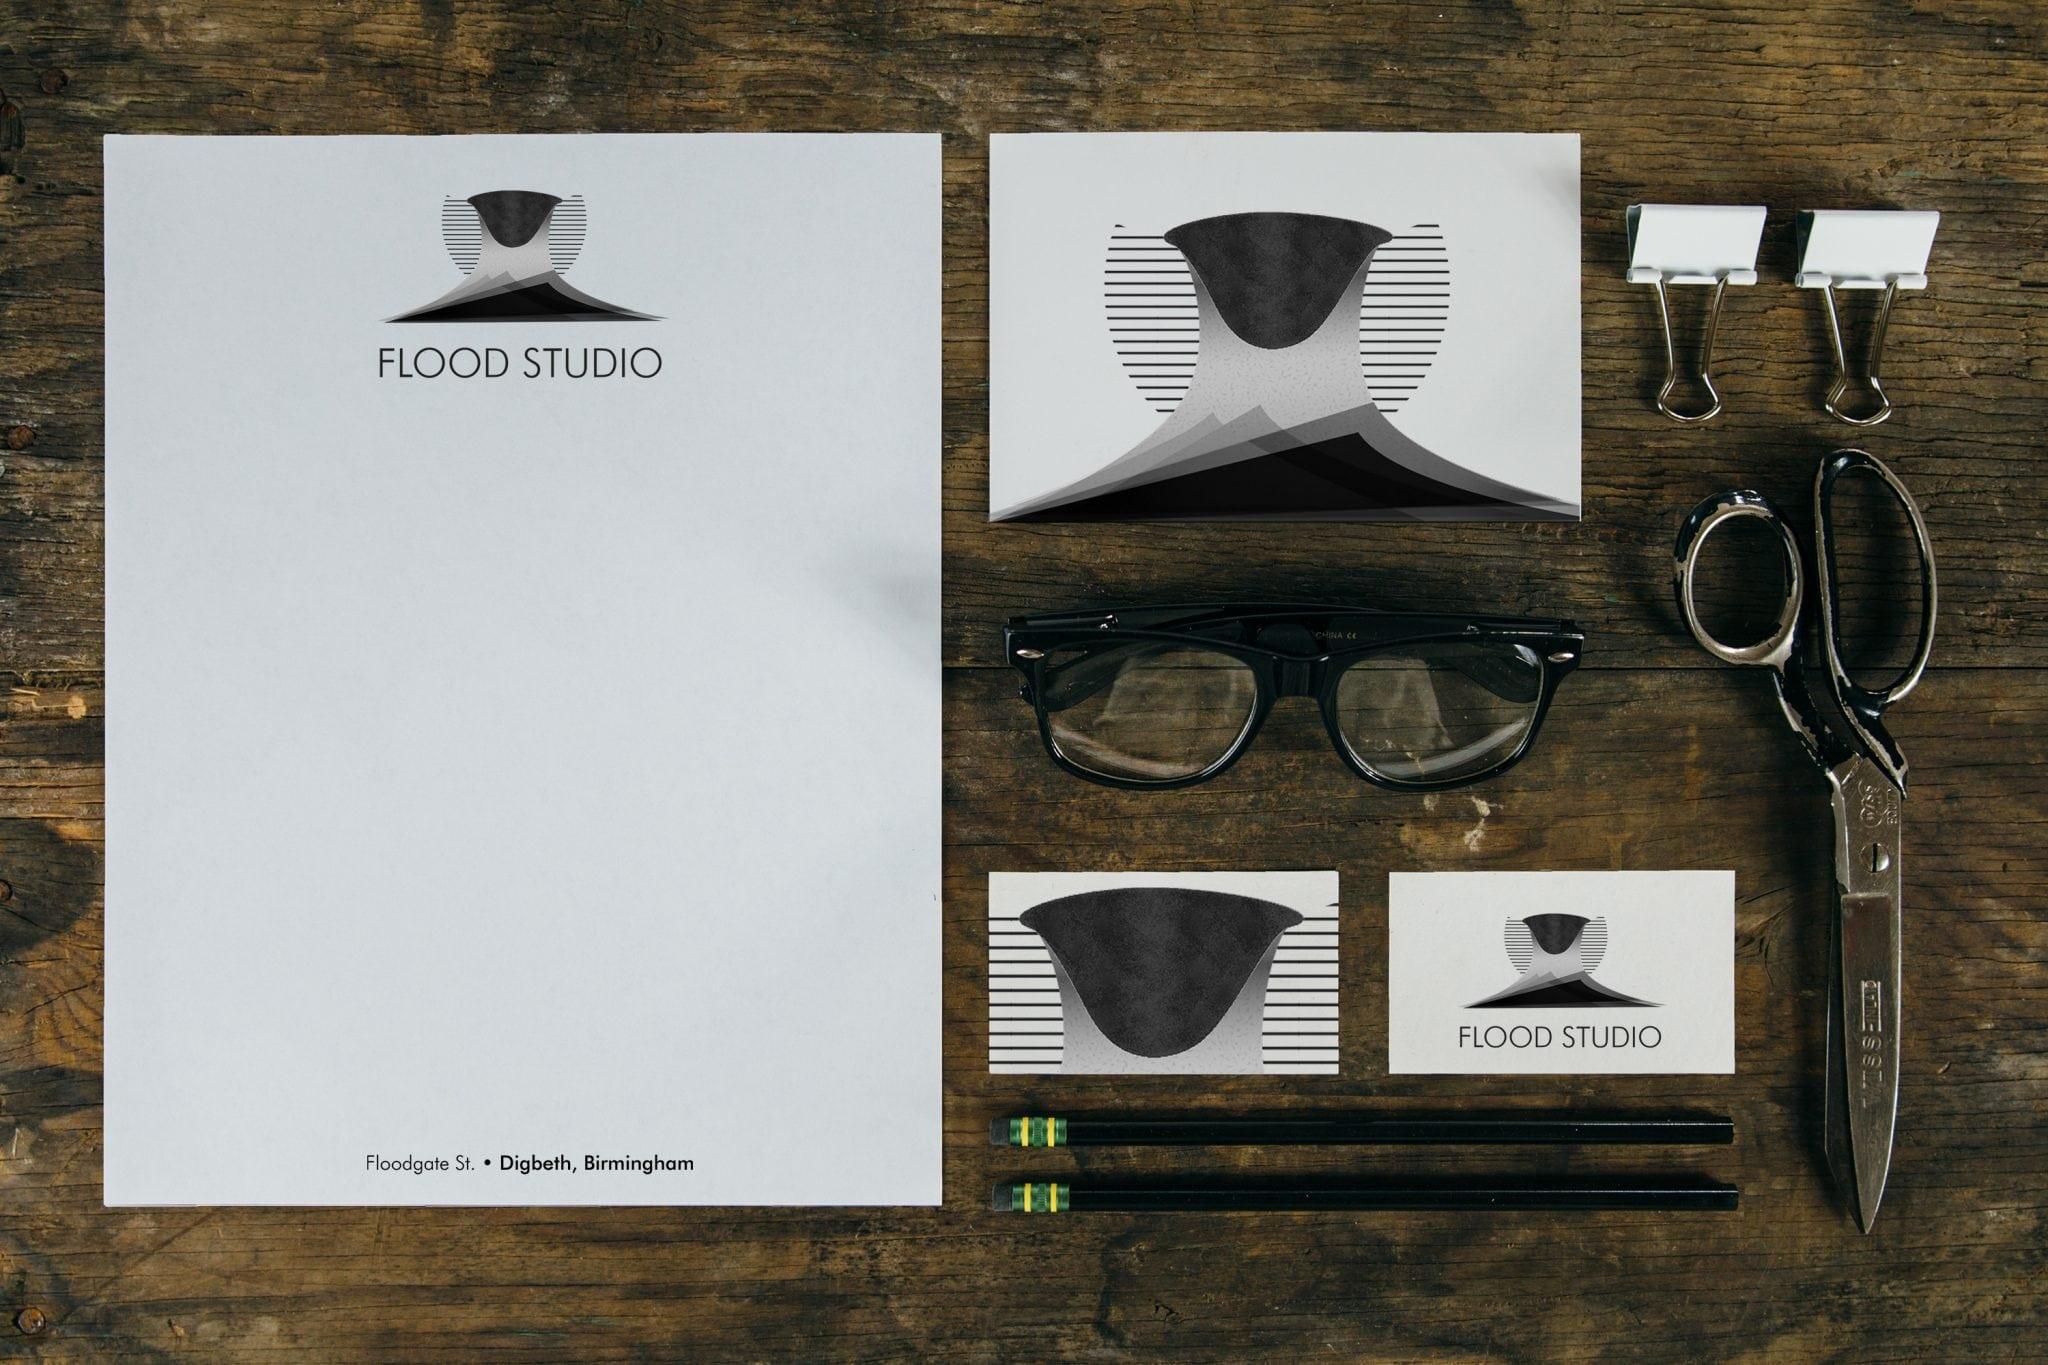 saint loupe, digital agency birmingham, creative studio uk, graphic designer birmingham